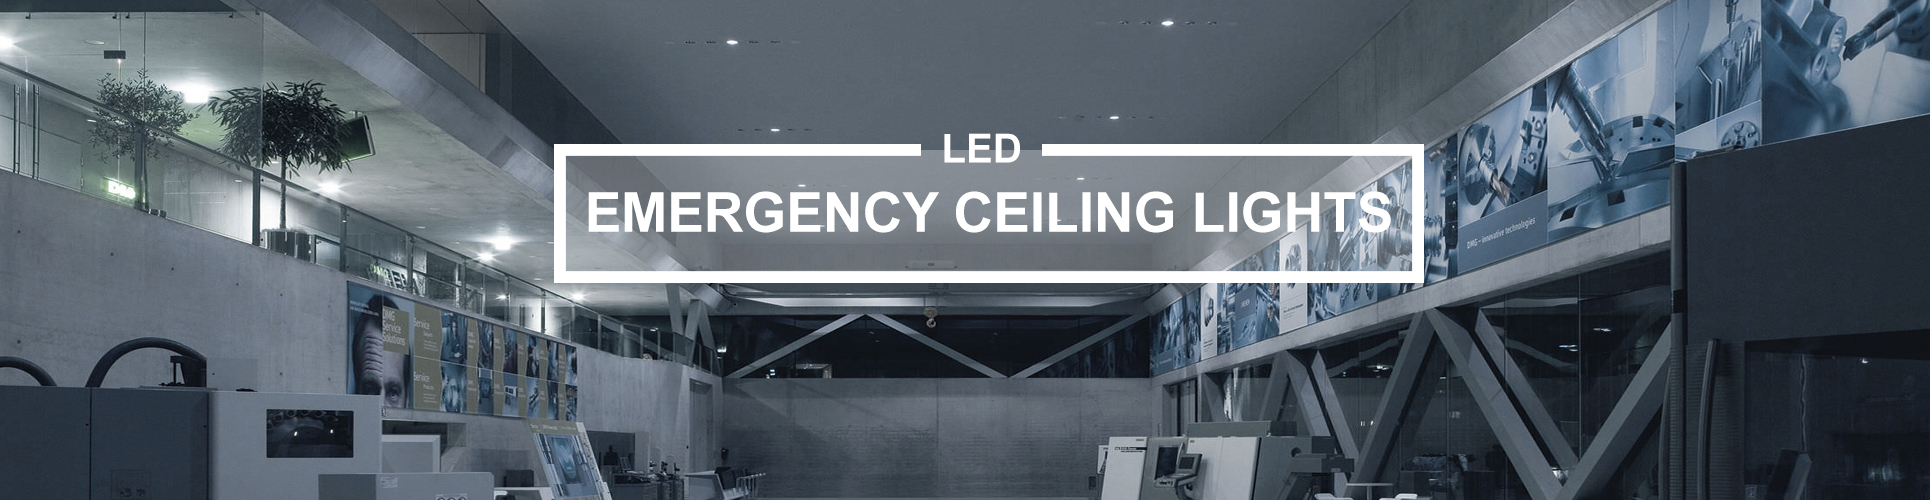 Emergency ceiling lights